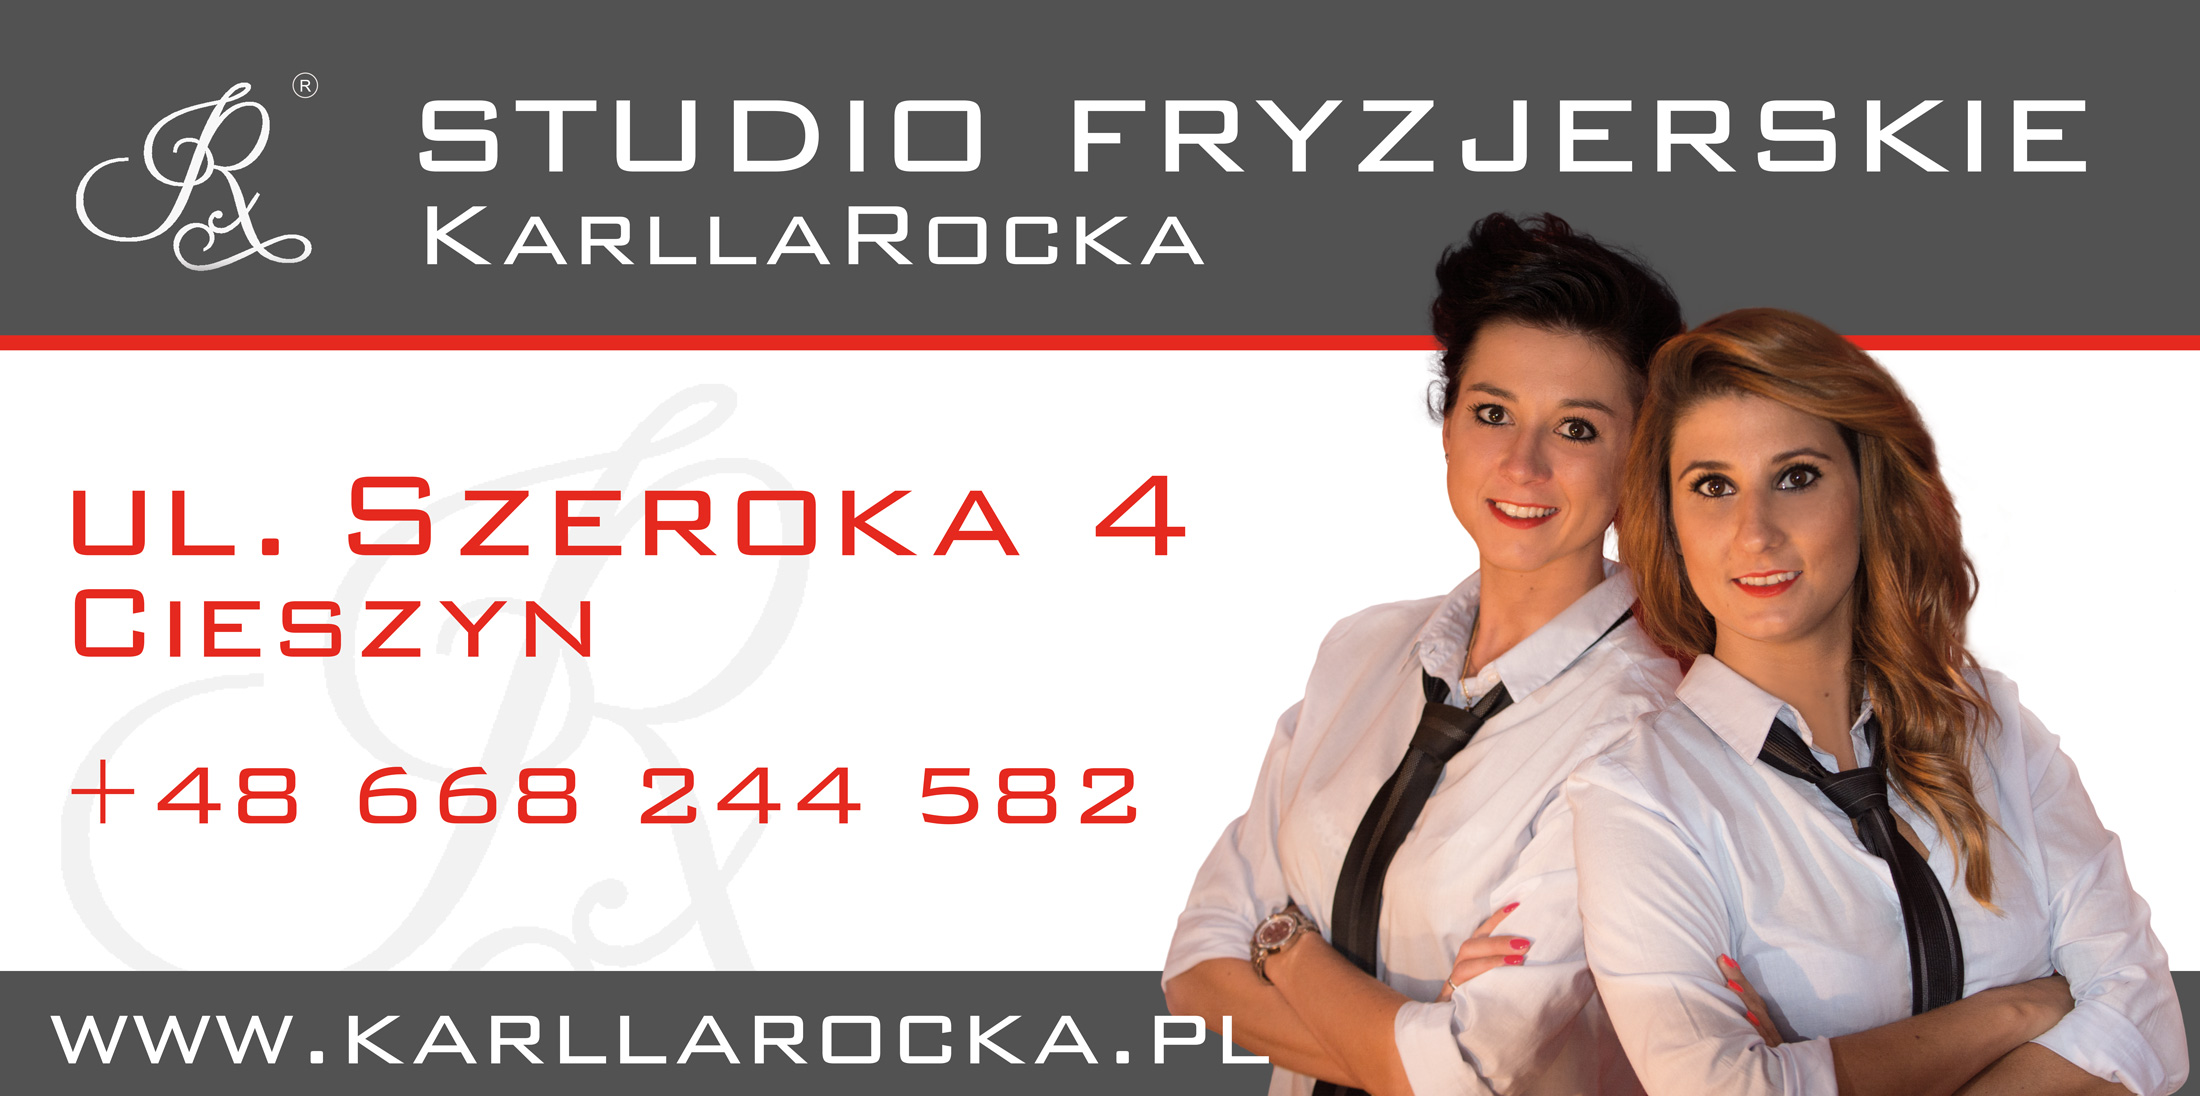 Karllarocka